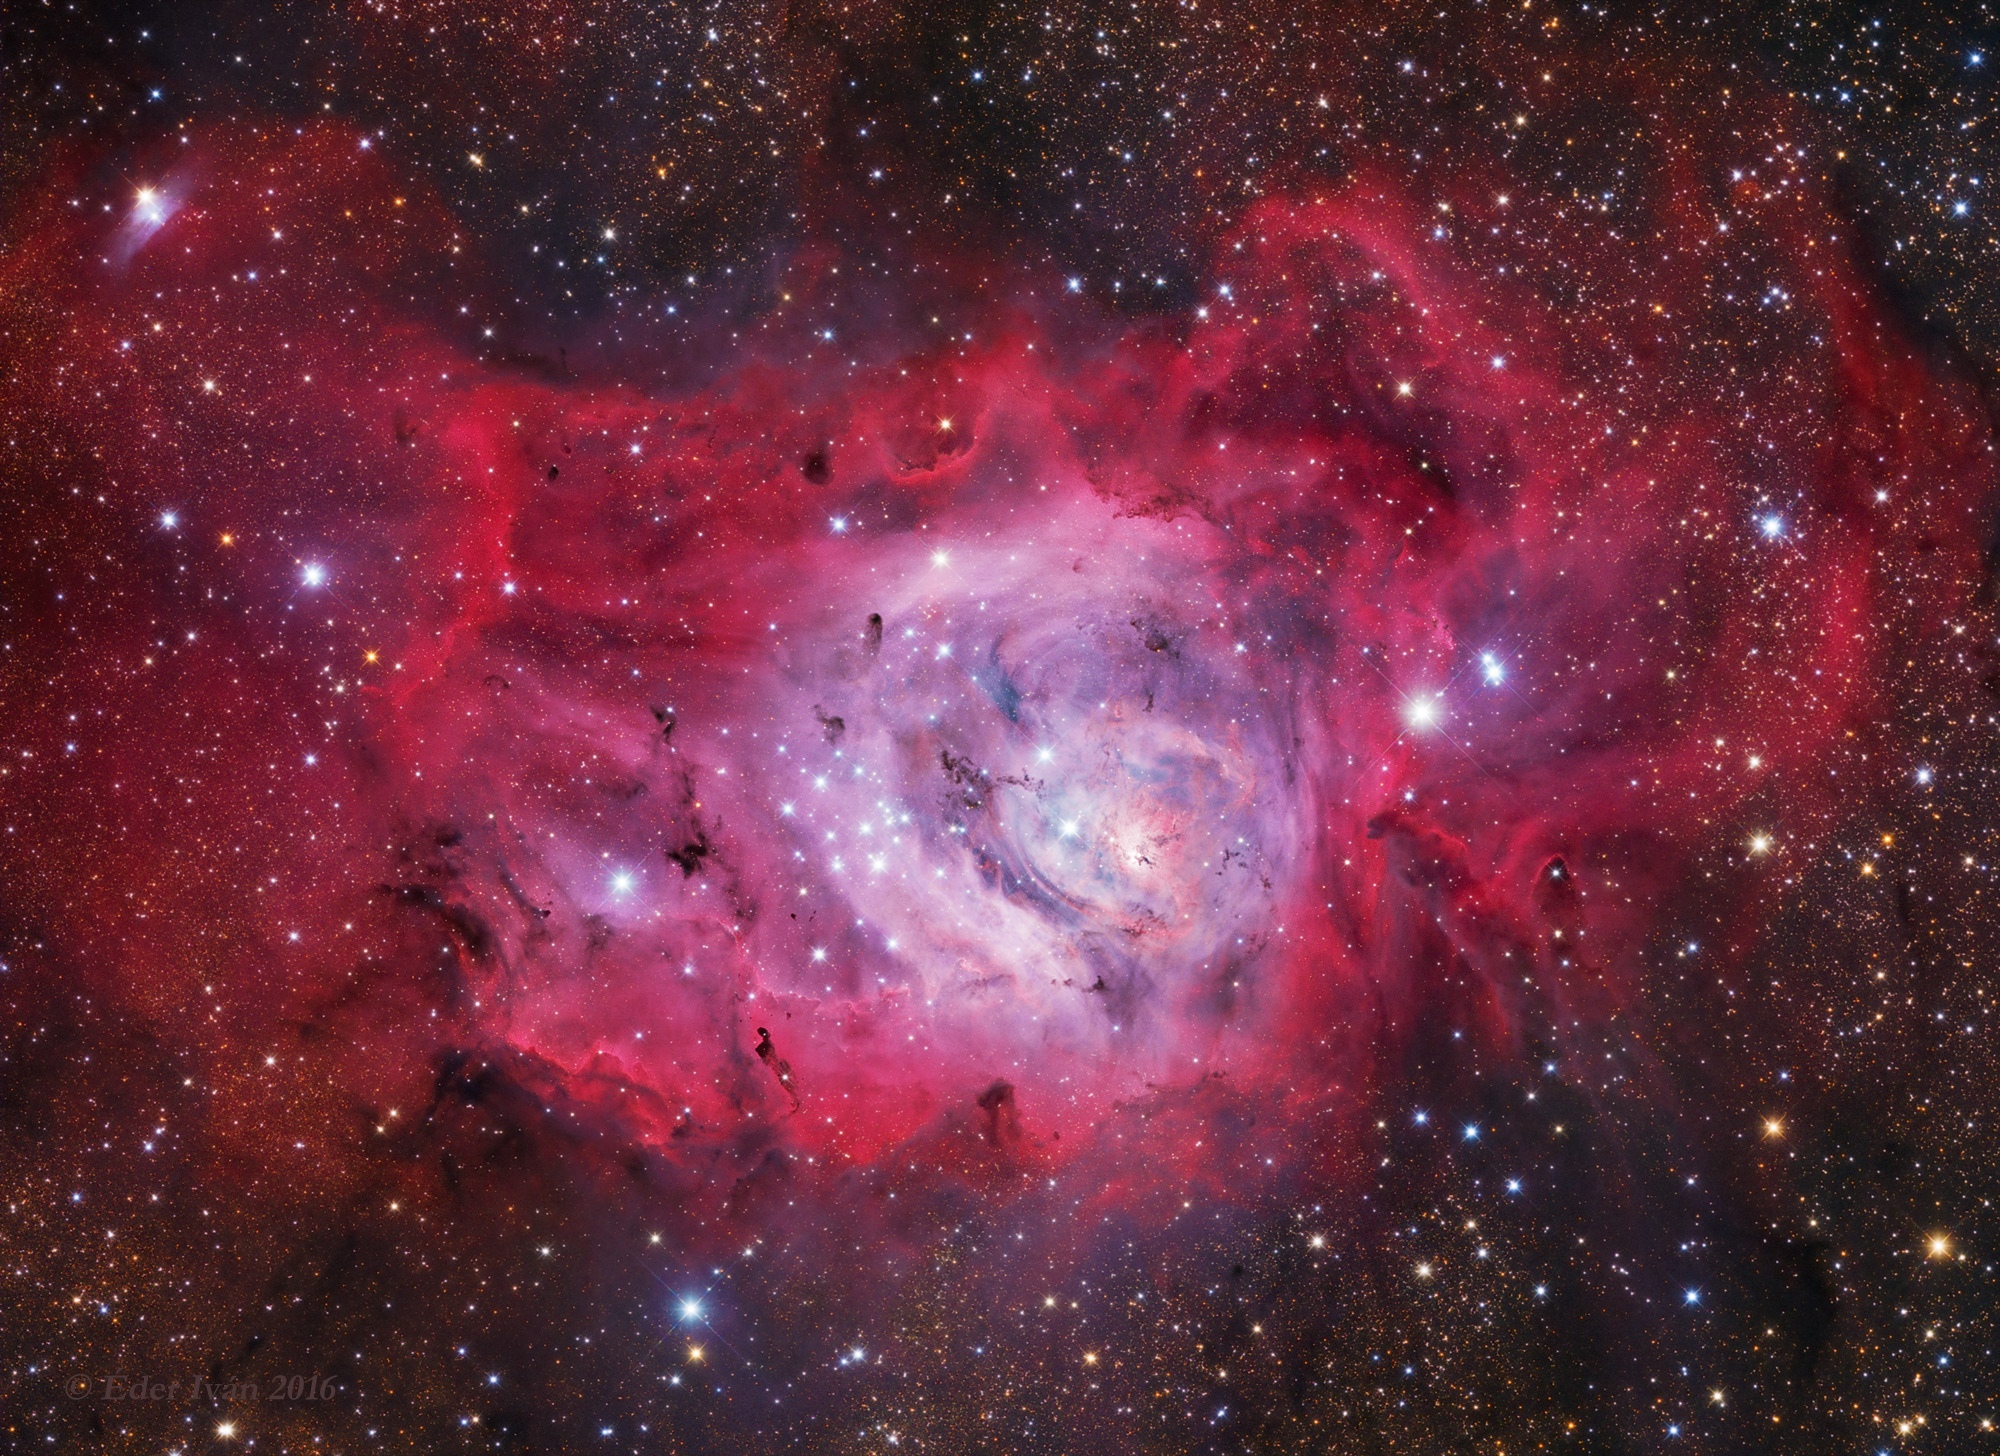 A Lagúna-köd (Messier 8)